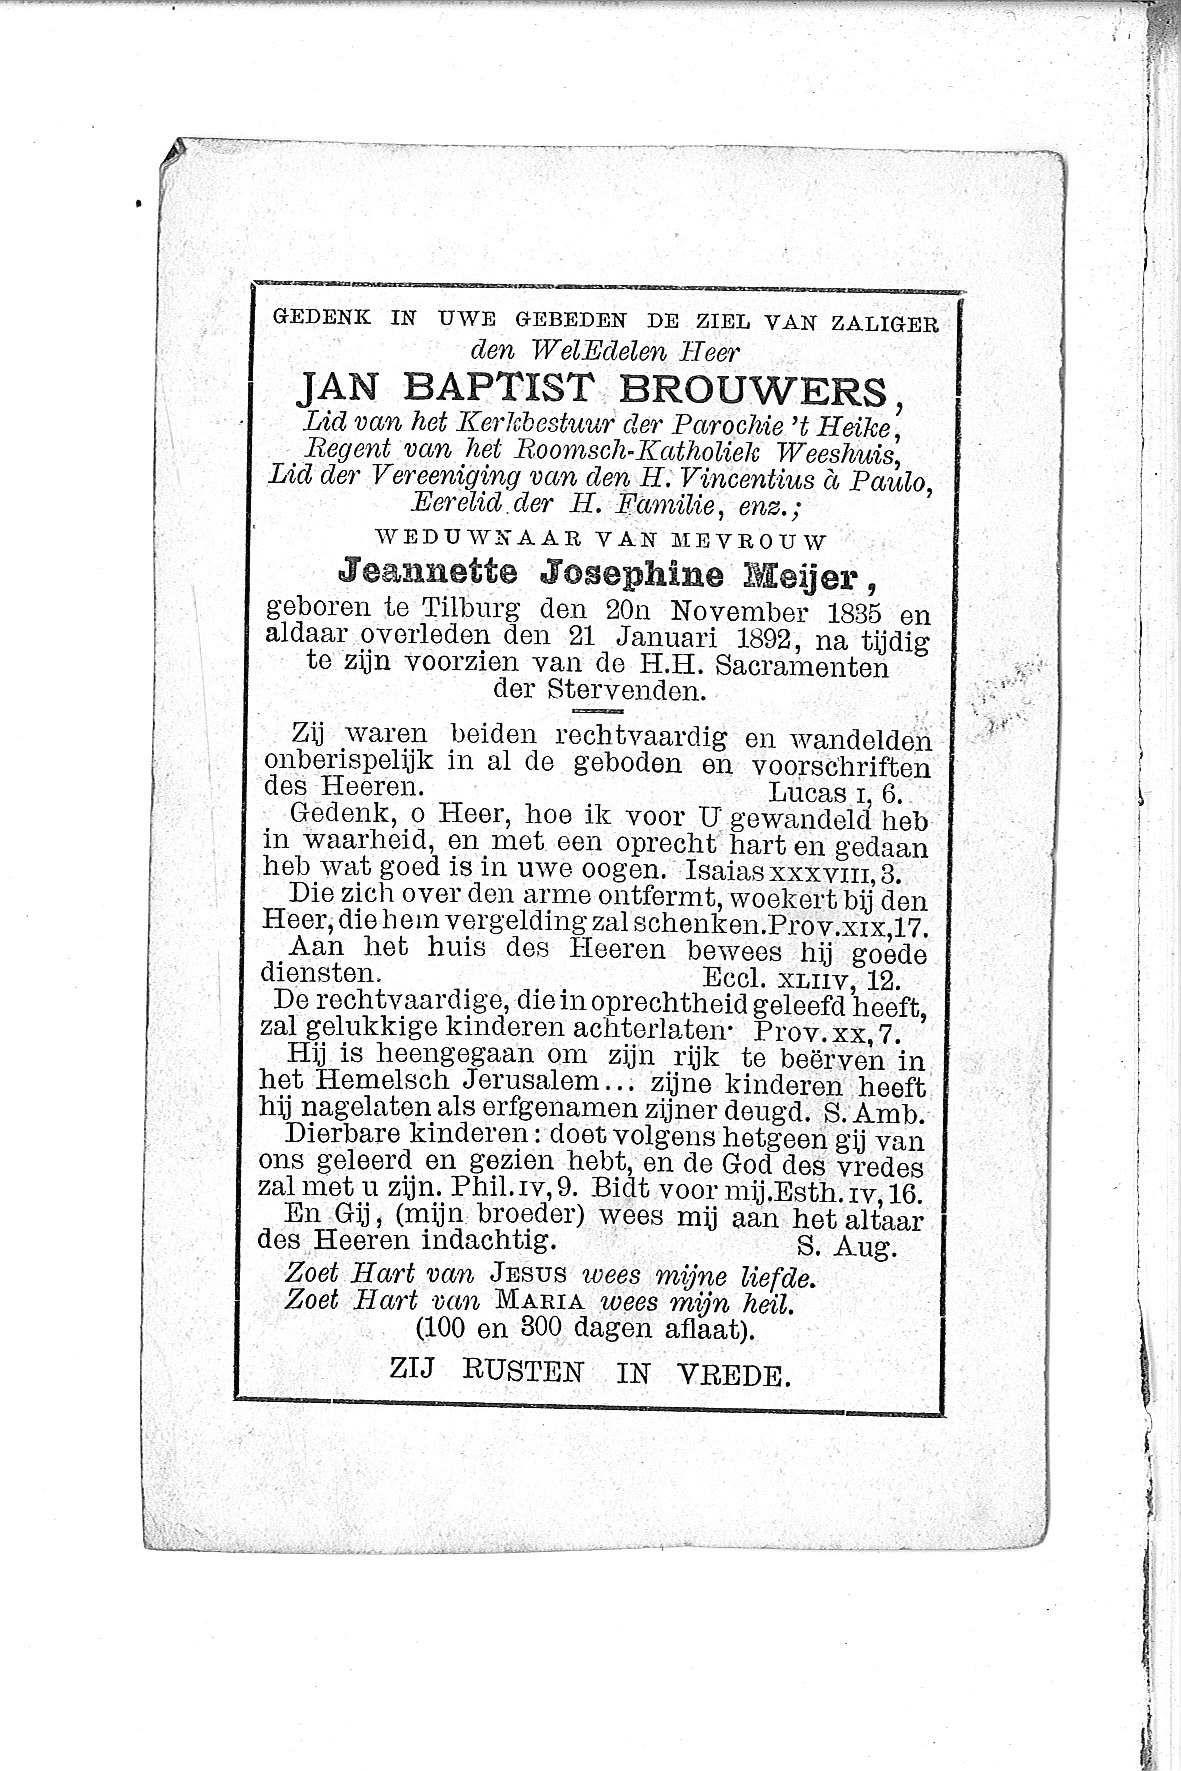 Jan Baptist (1892) 20110805165022_00068.jpg